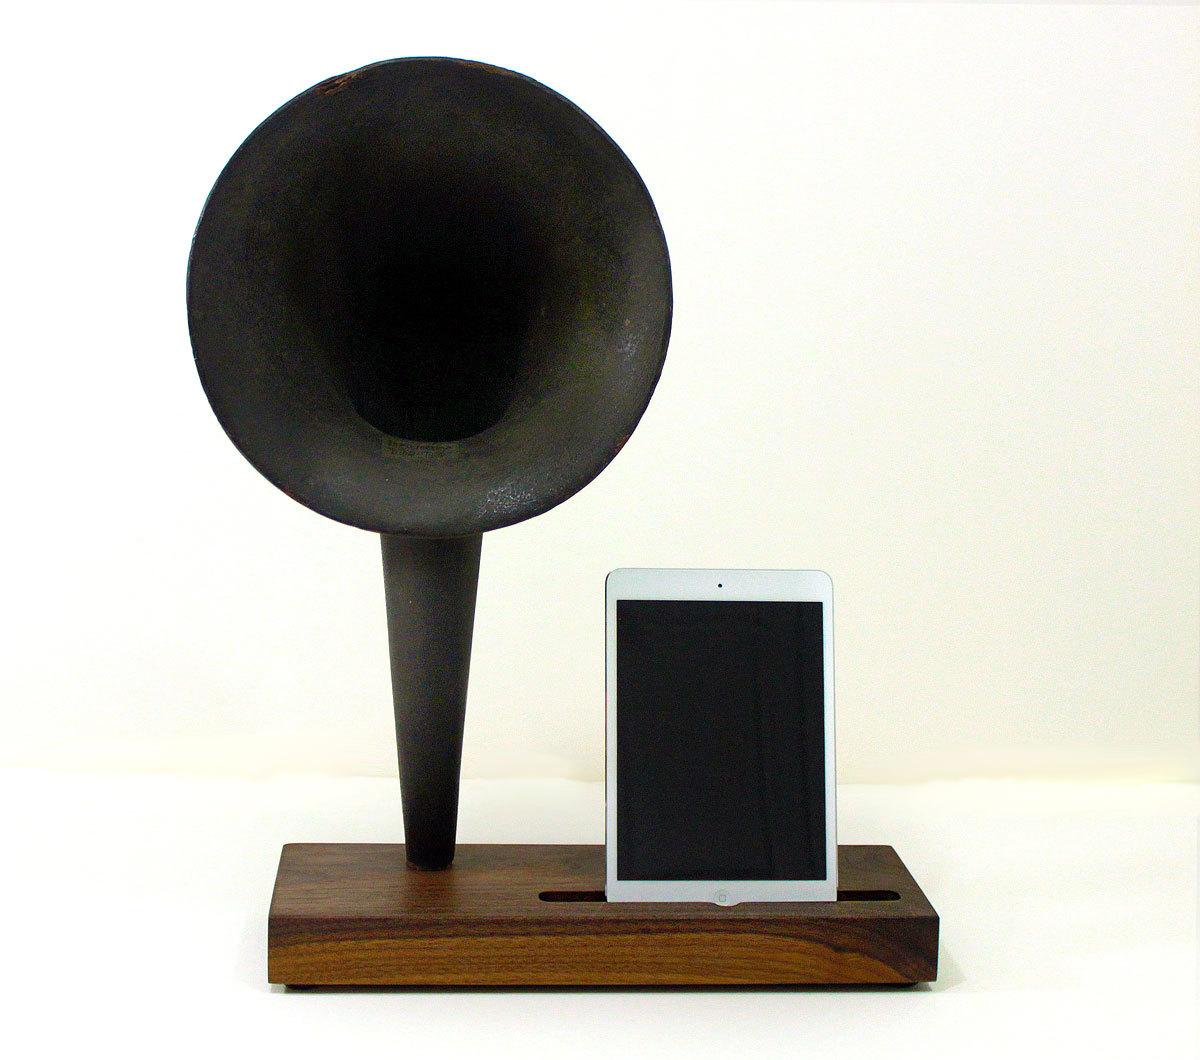 accessori-creativi-iphone-ipad-kindle-laptop-03